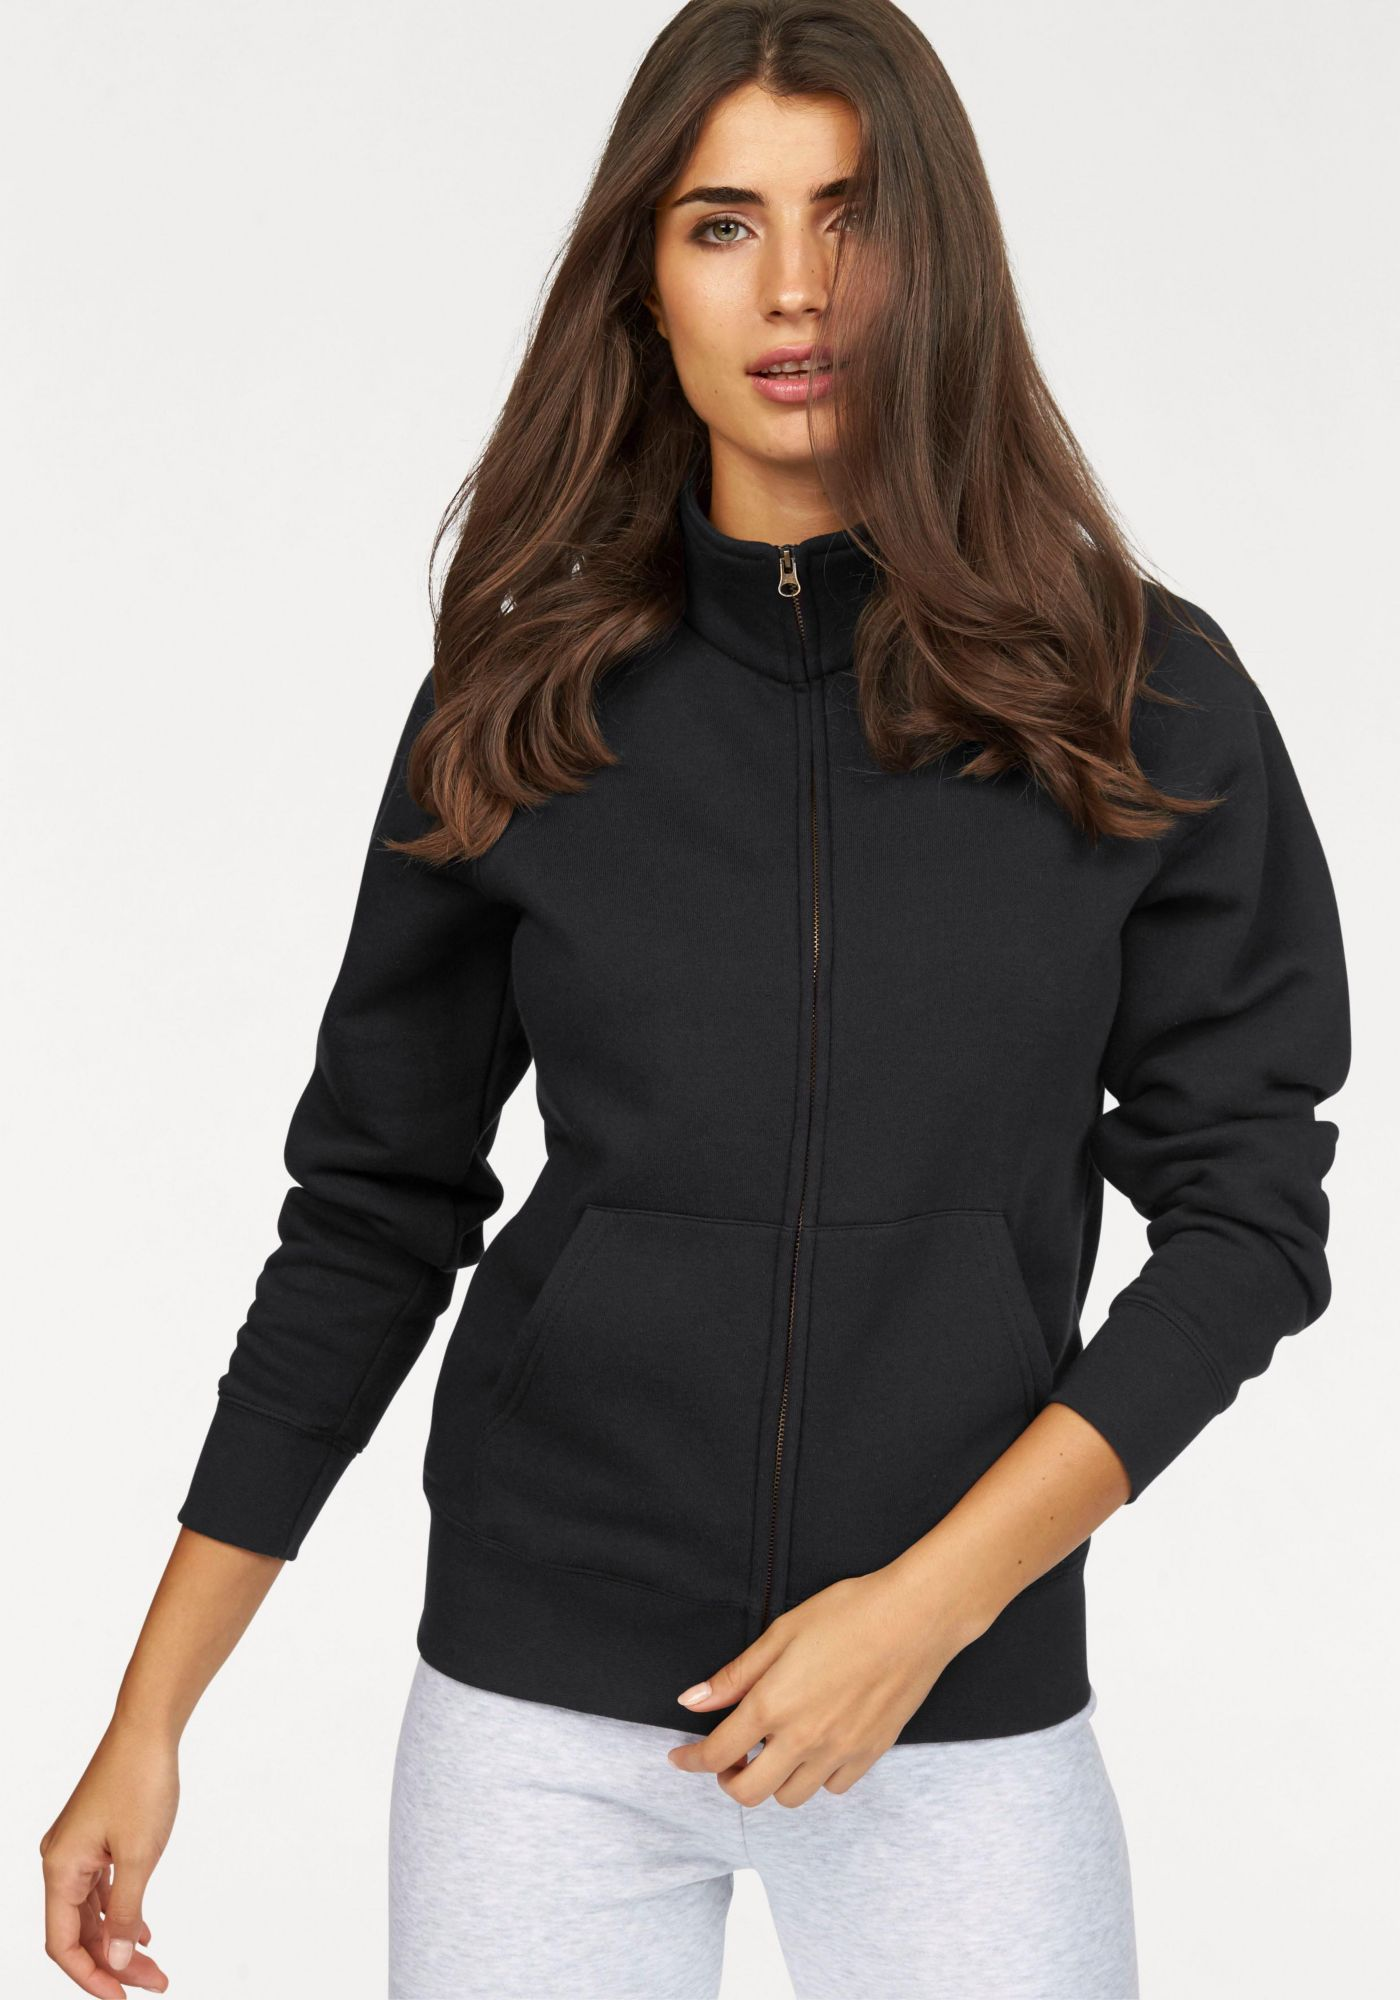 FRUIT OF THE LOOM Fruit of the Loom Sweatshirt »Lady-Fit Premium Sweat Jacket«